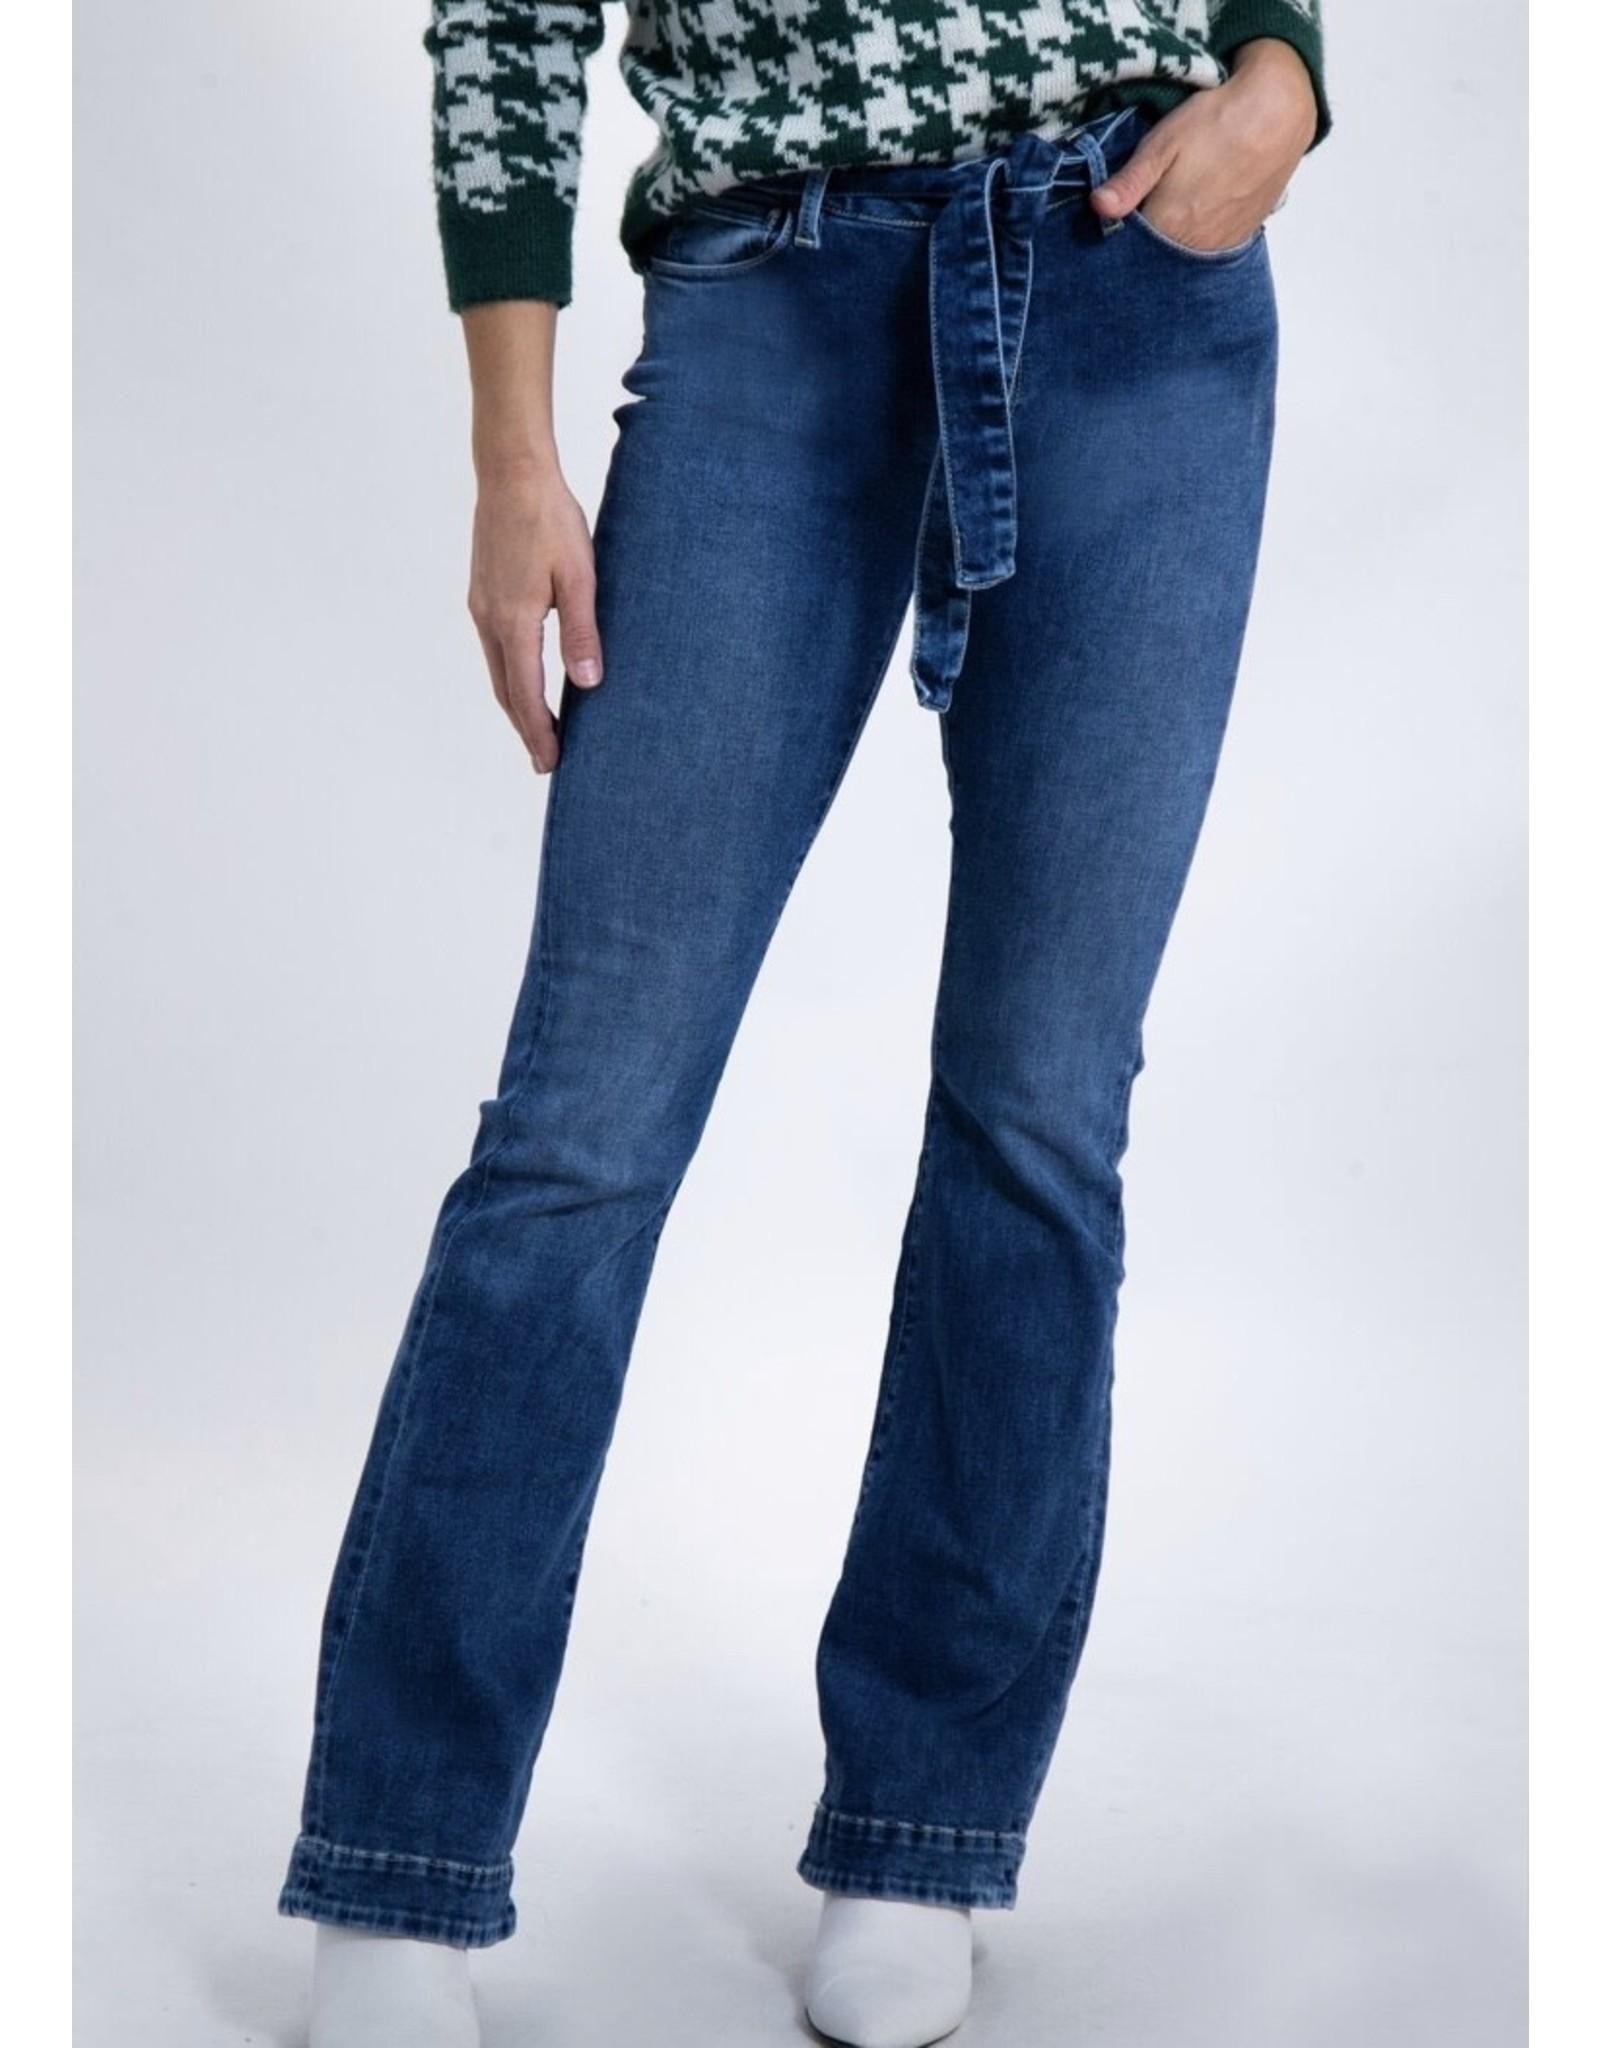 Garcia Celia flared jeans